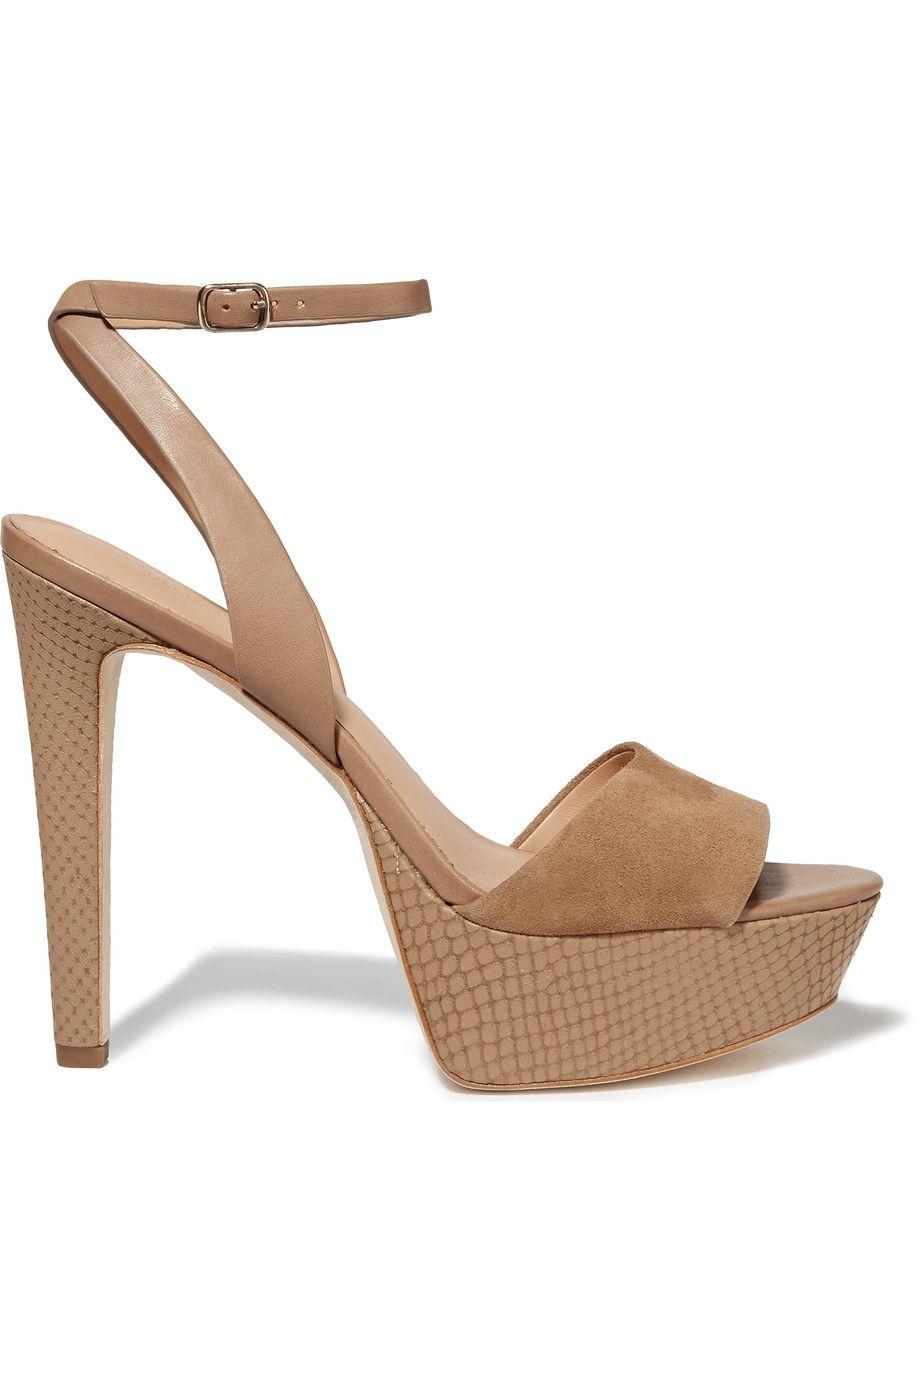 6d0634a6075 HALSTON HERITAGE Bobbie Leather And Suede Sandals. #halstonheritage #shoes # sandals